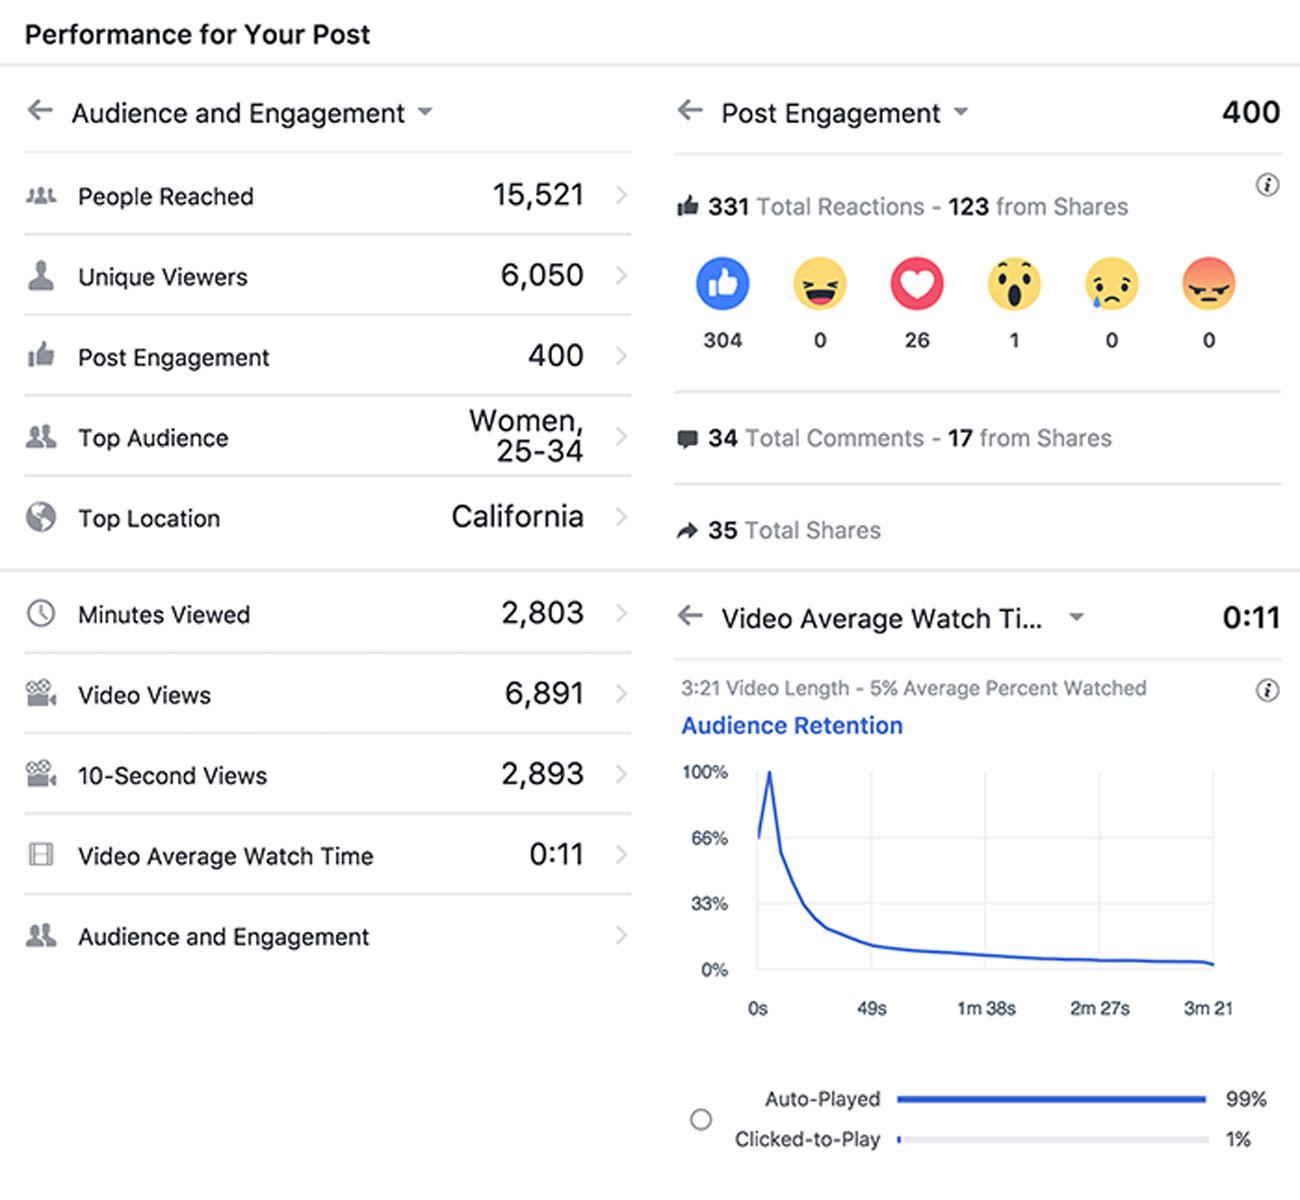 2017-09-20-HealthCare-Towne-Facebook-Analytics---FINAL.jpg